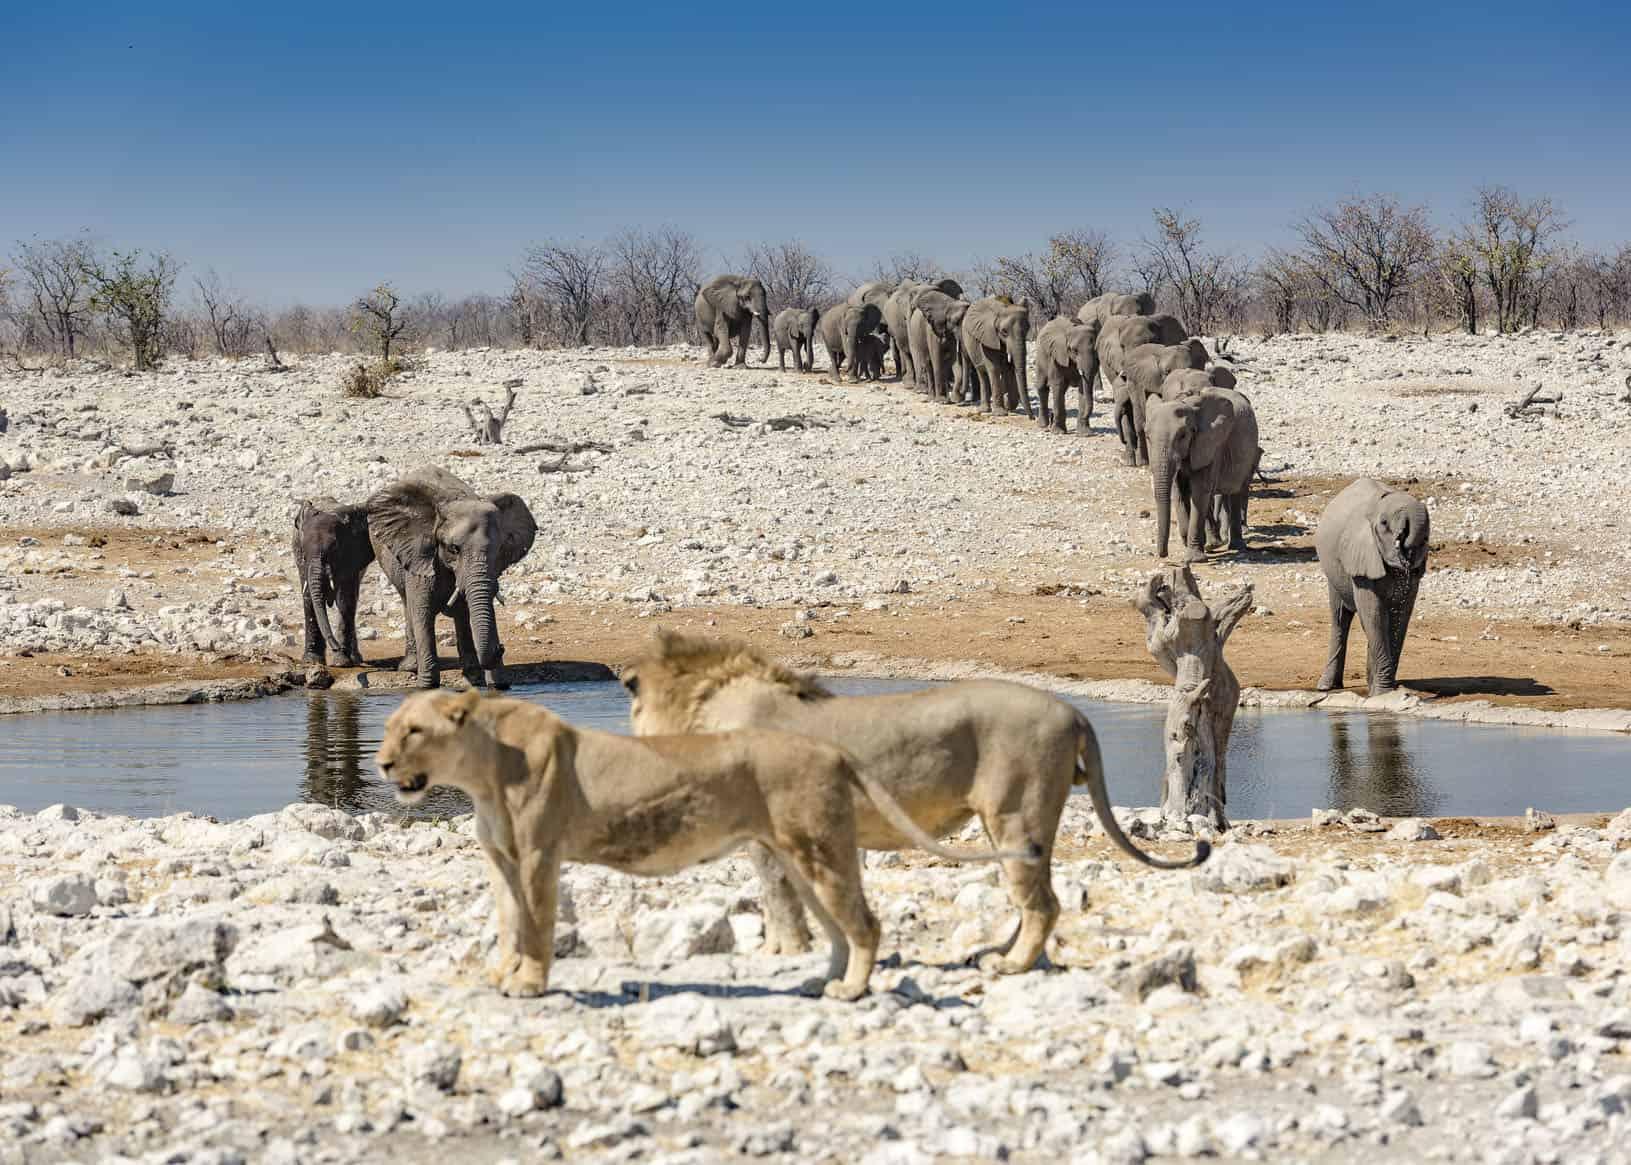 Wasserloch, Etosha National Park, Namibia